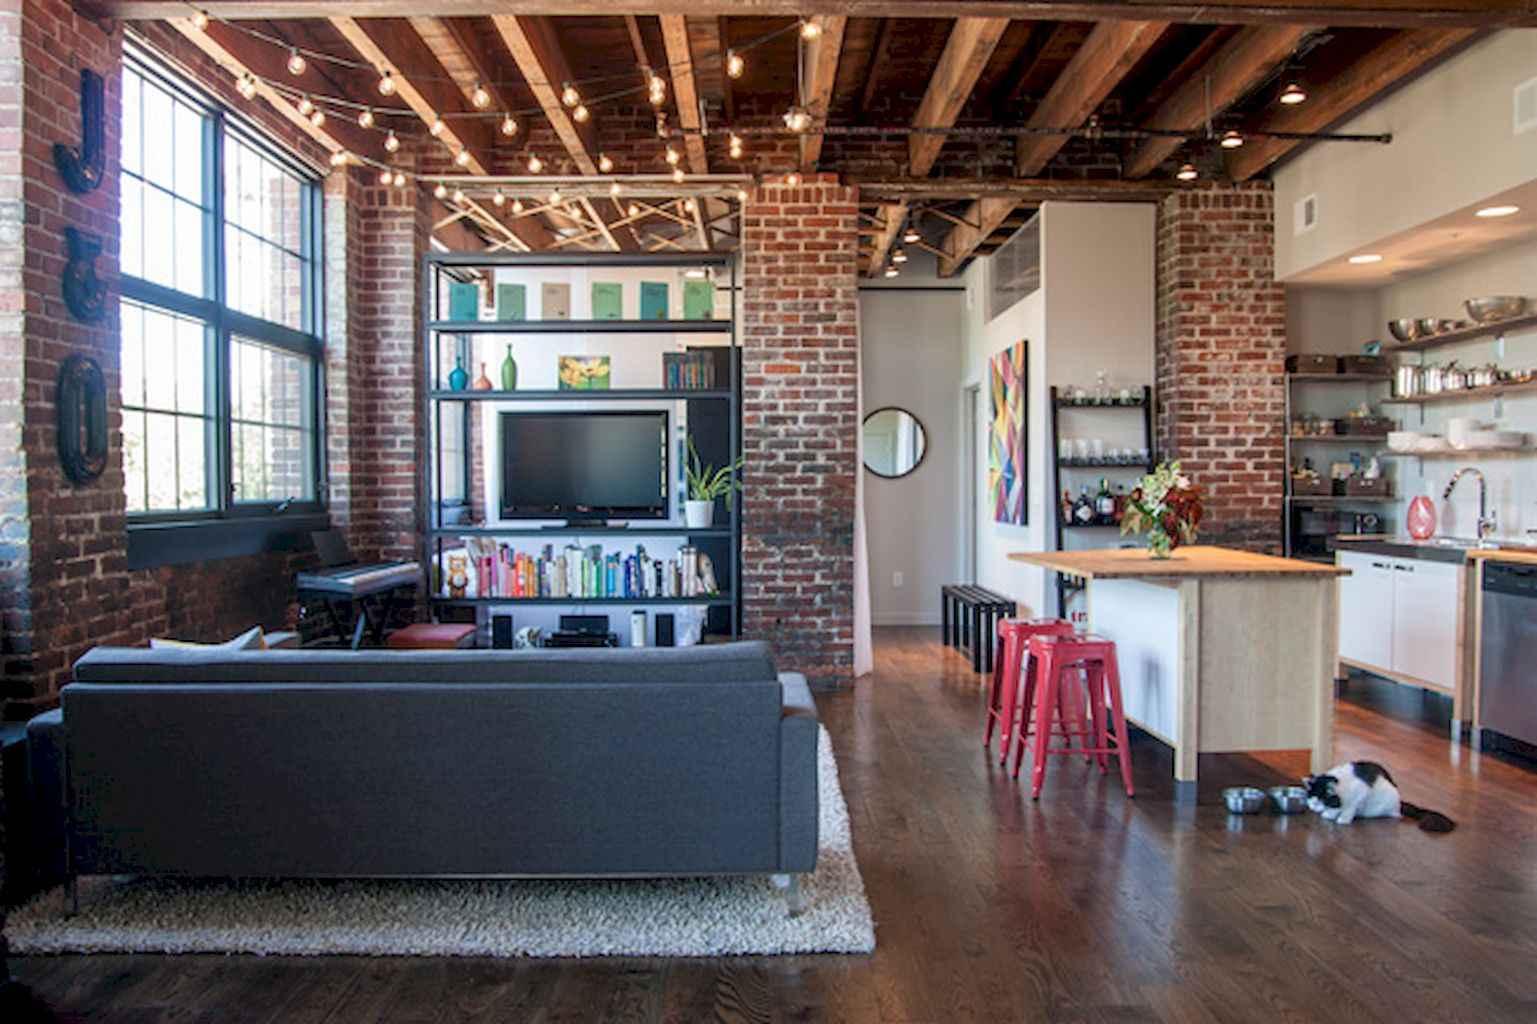 Cool creative loft apartment decorating ideas (4)